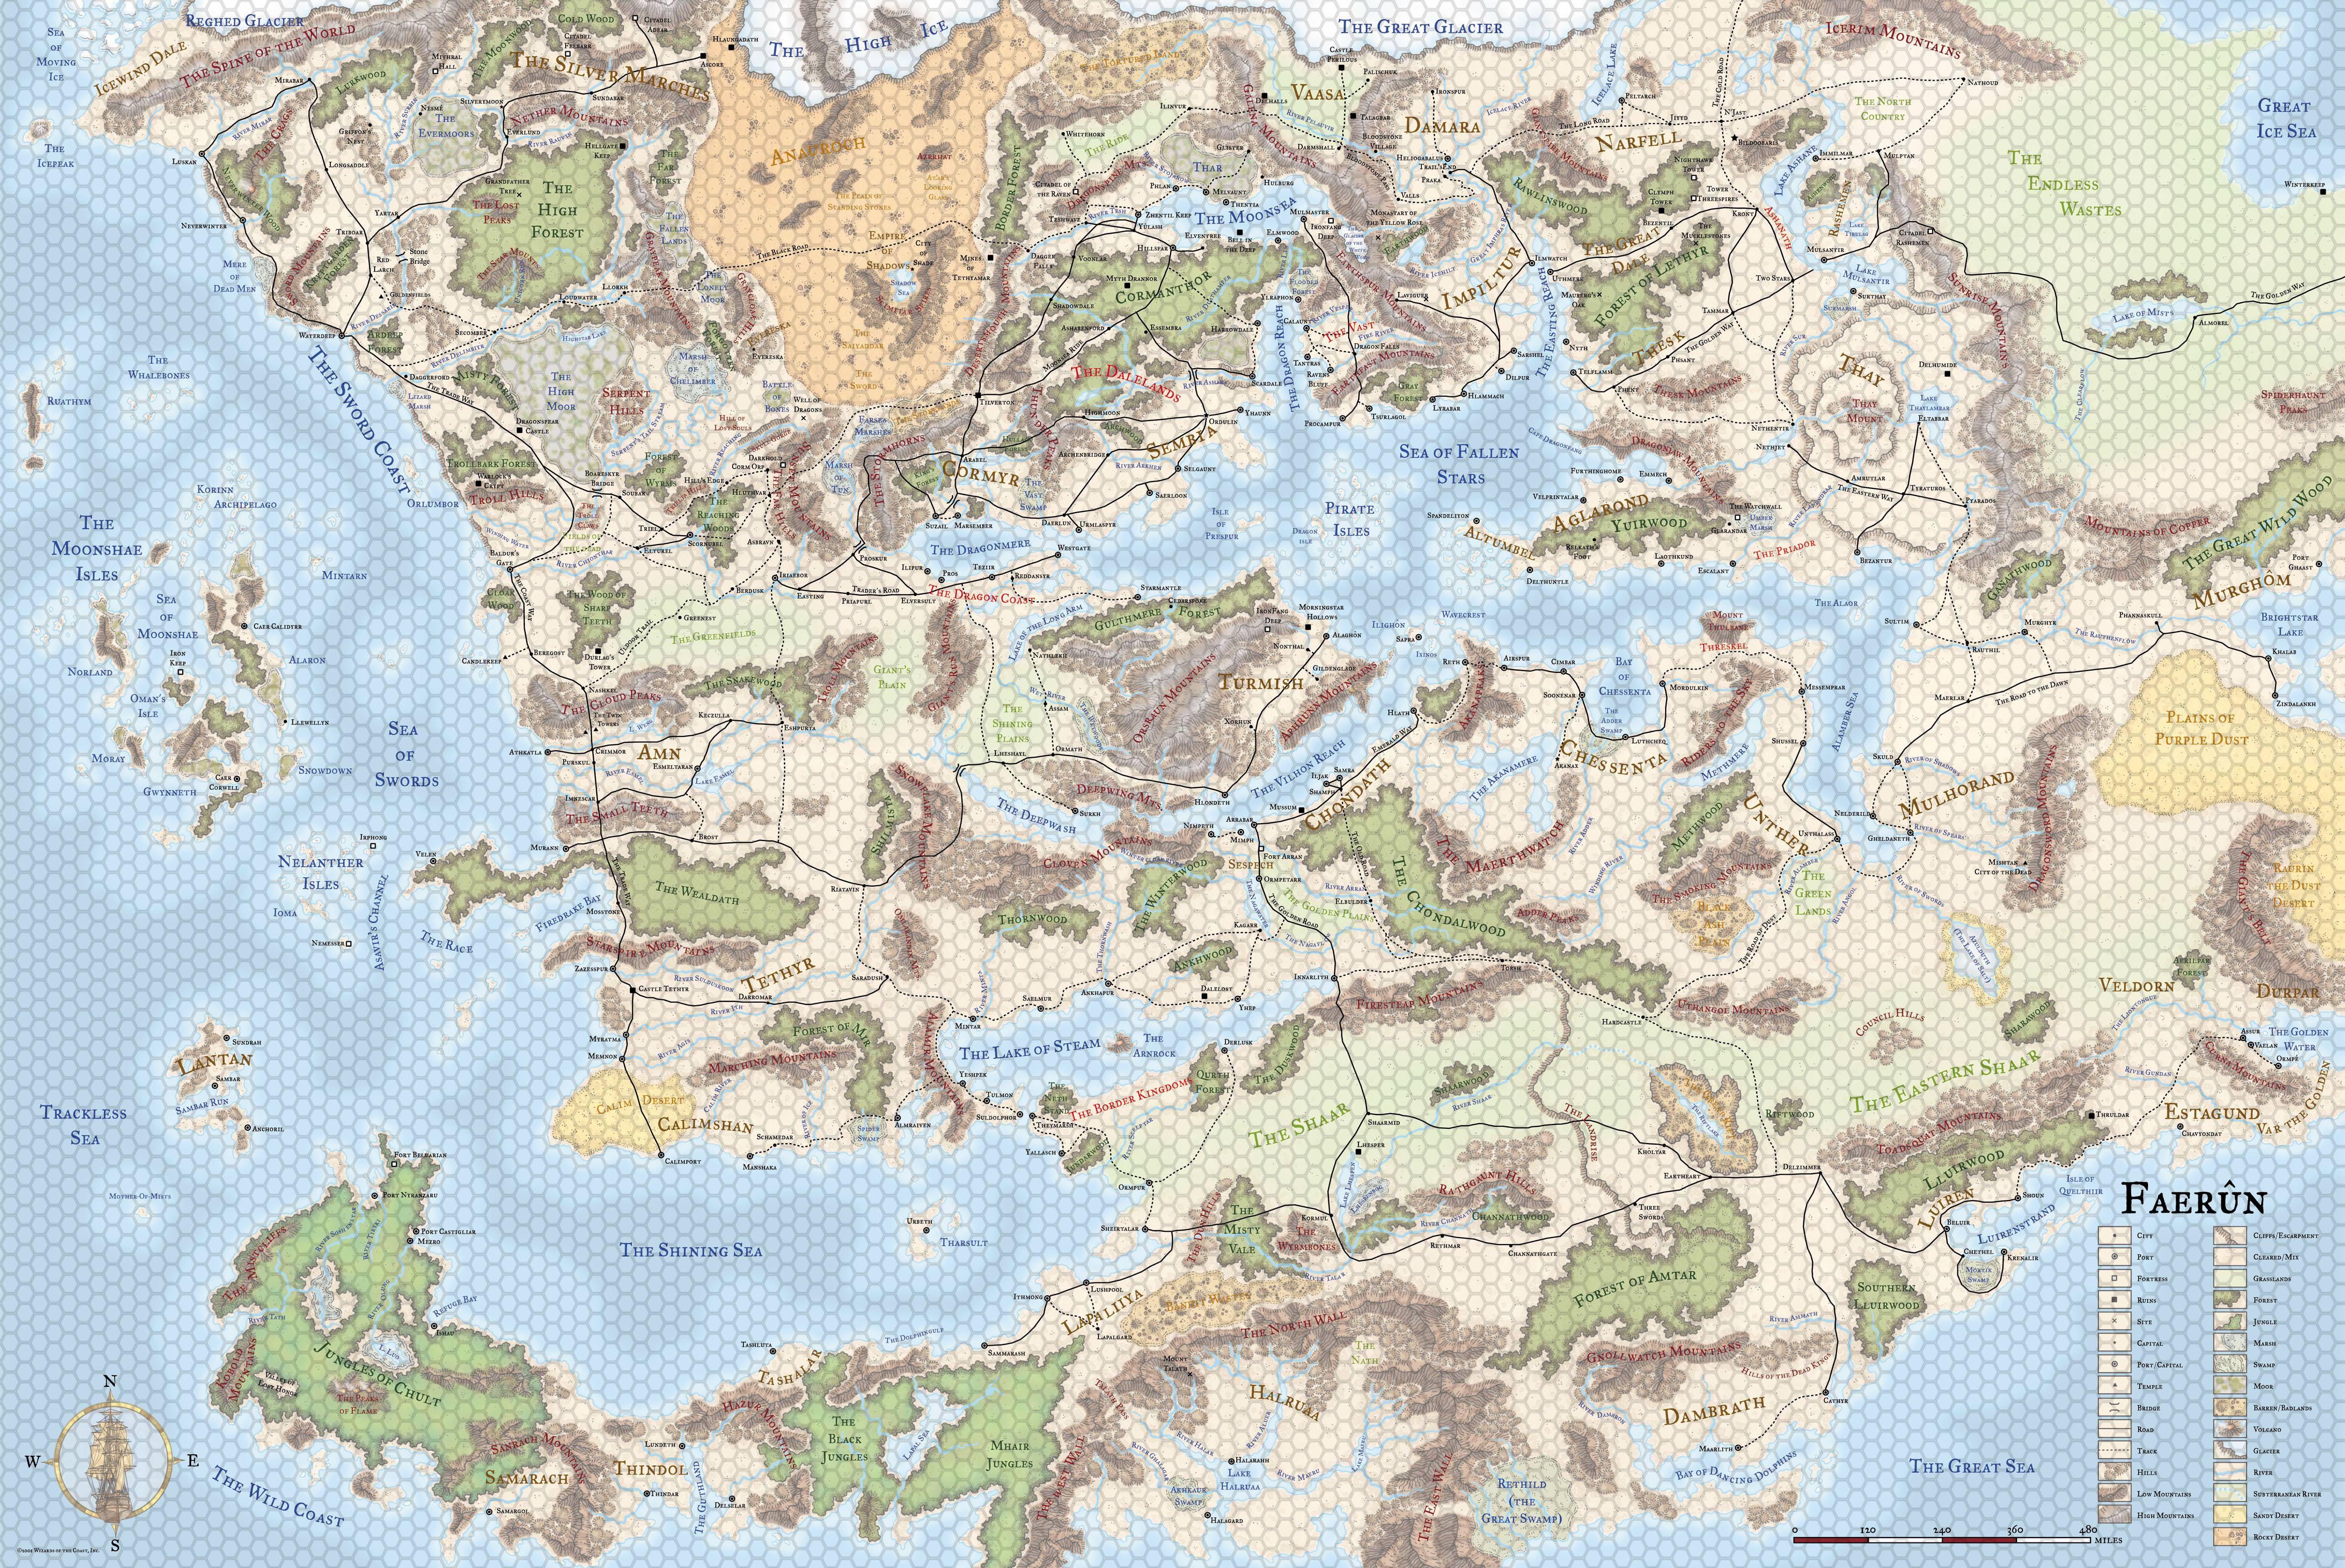 Faerun Map + Hex Overlay | D&D Maps in 2019 | Fantasy world ...